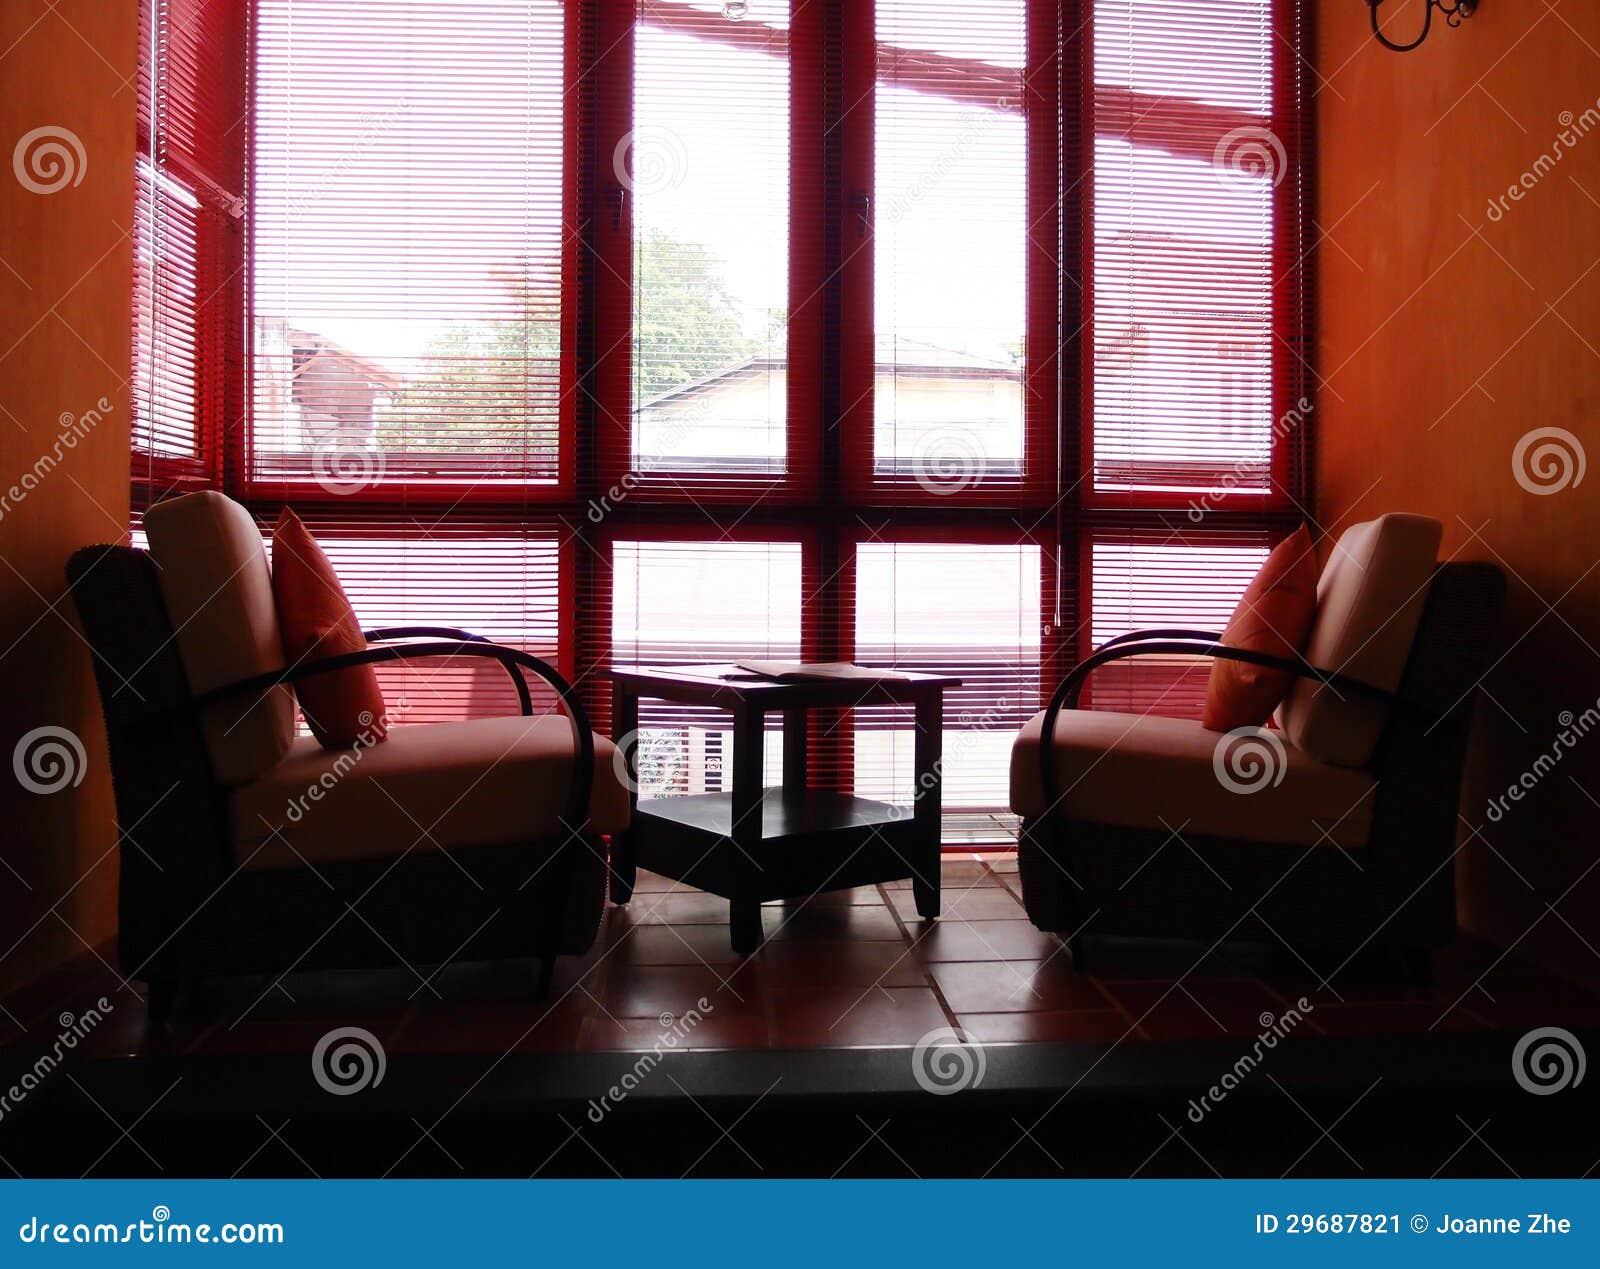 Mezzanine geleverde ruimte lange vensters stock - Foto mezzanine ...